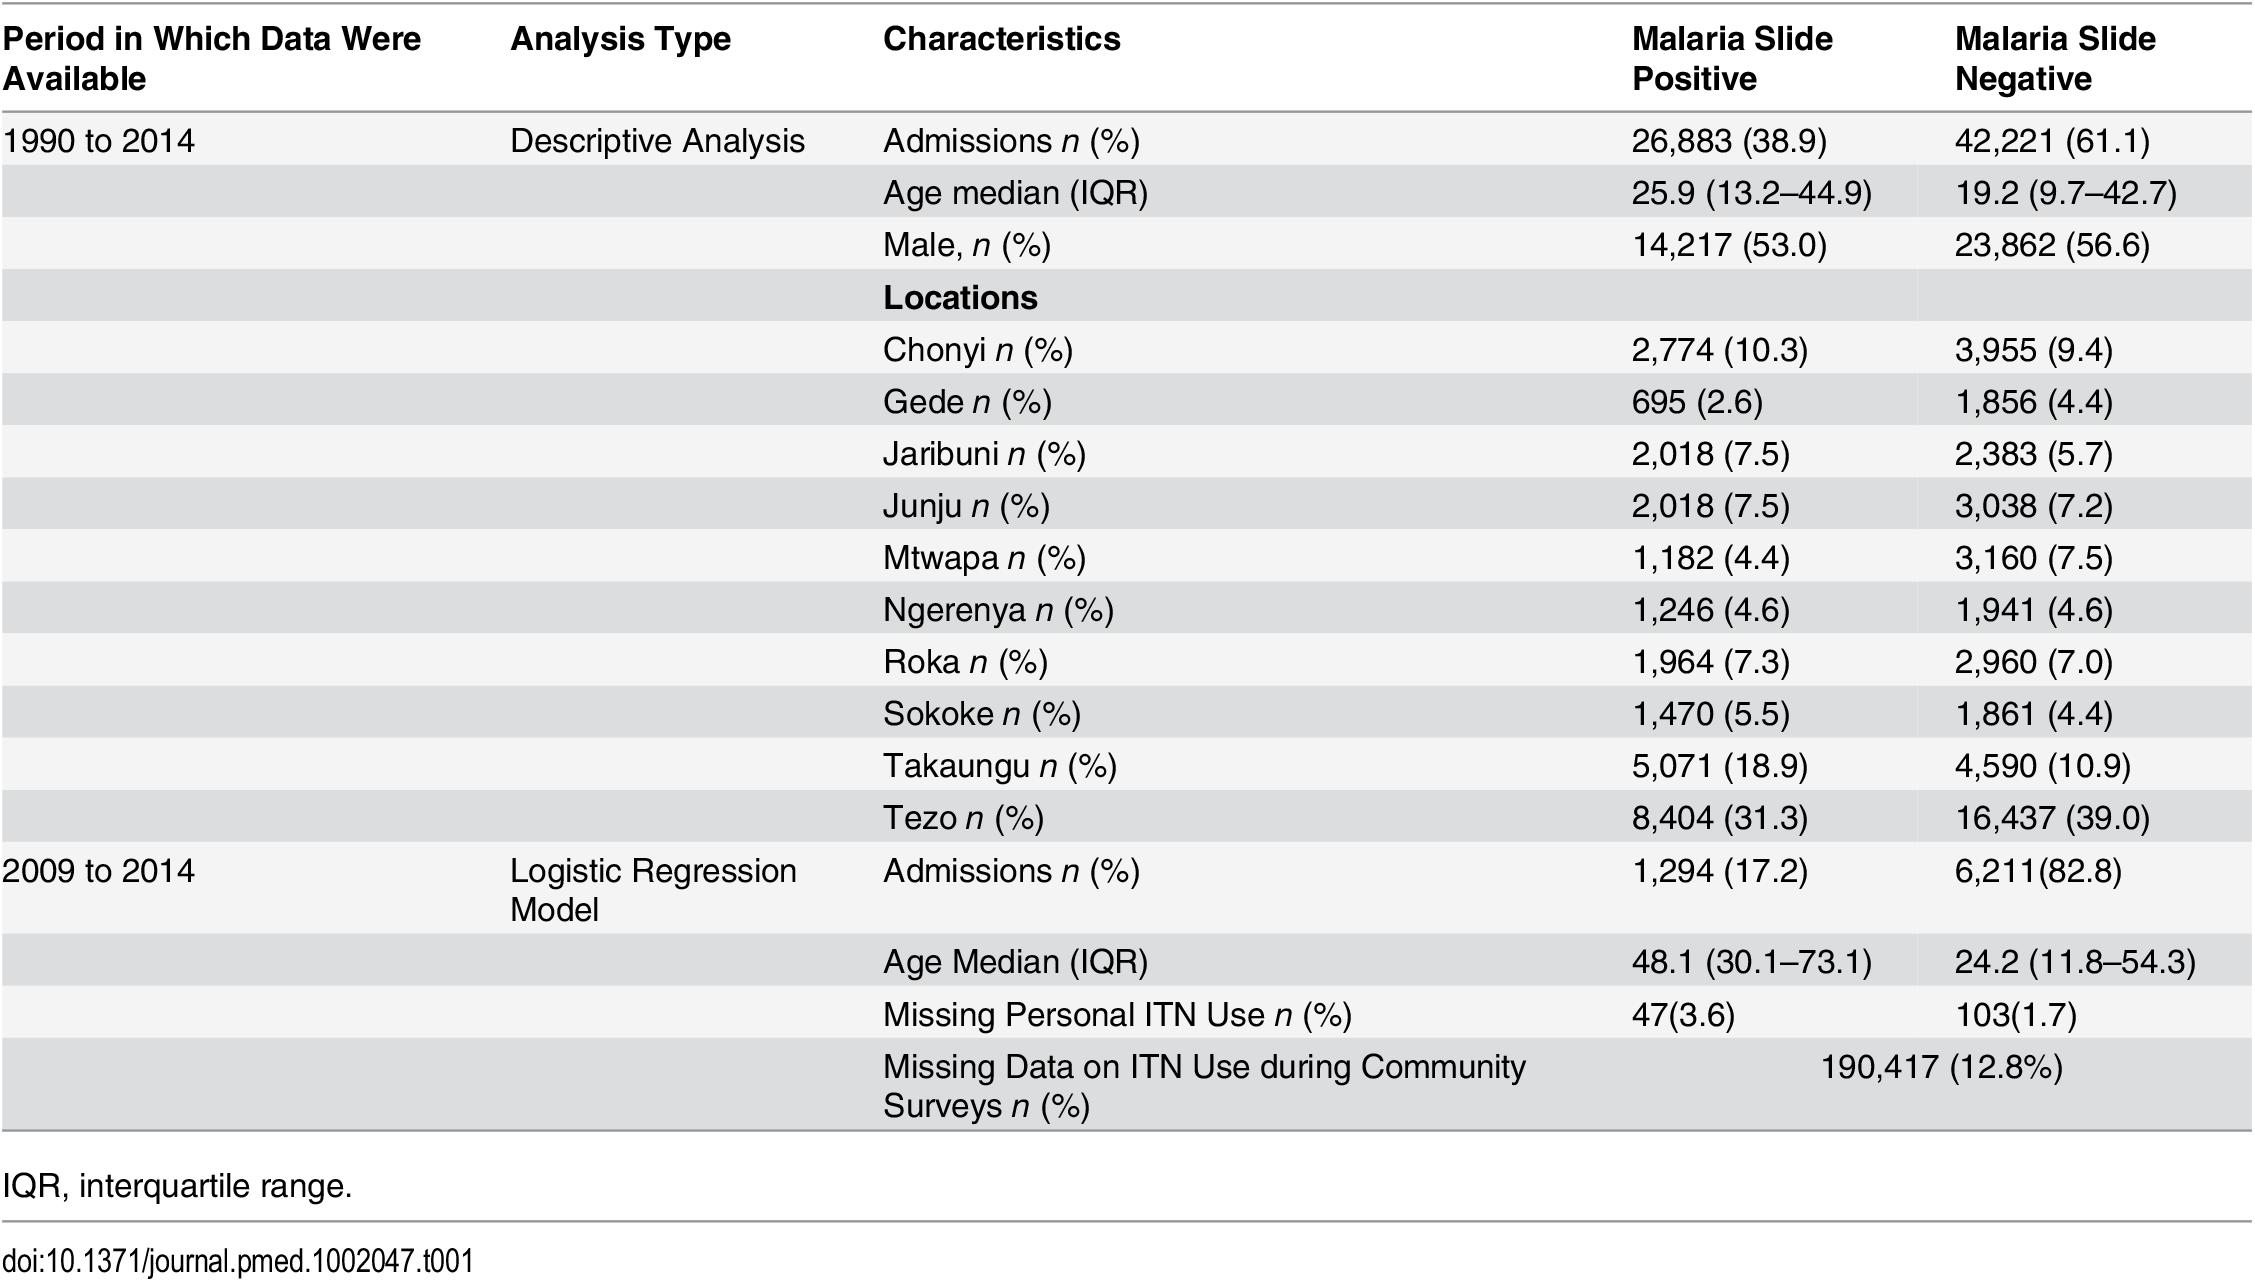 Characteristics of the study population.